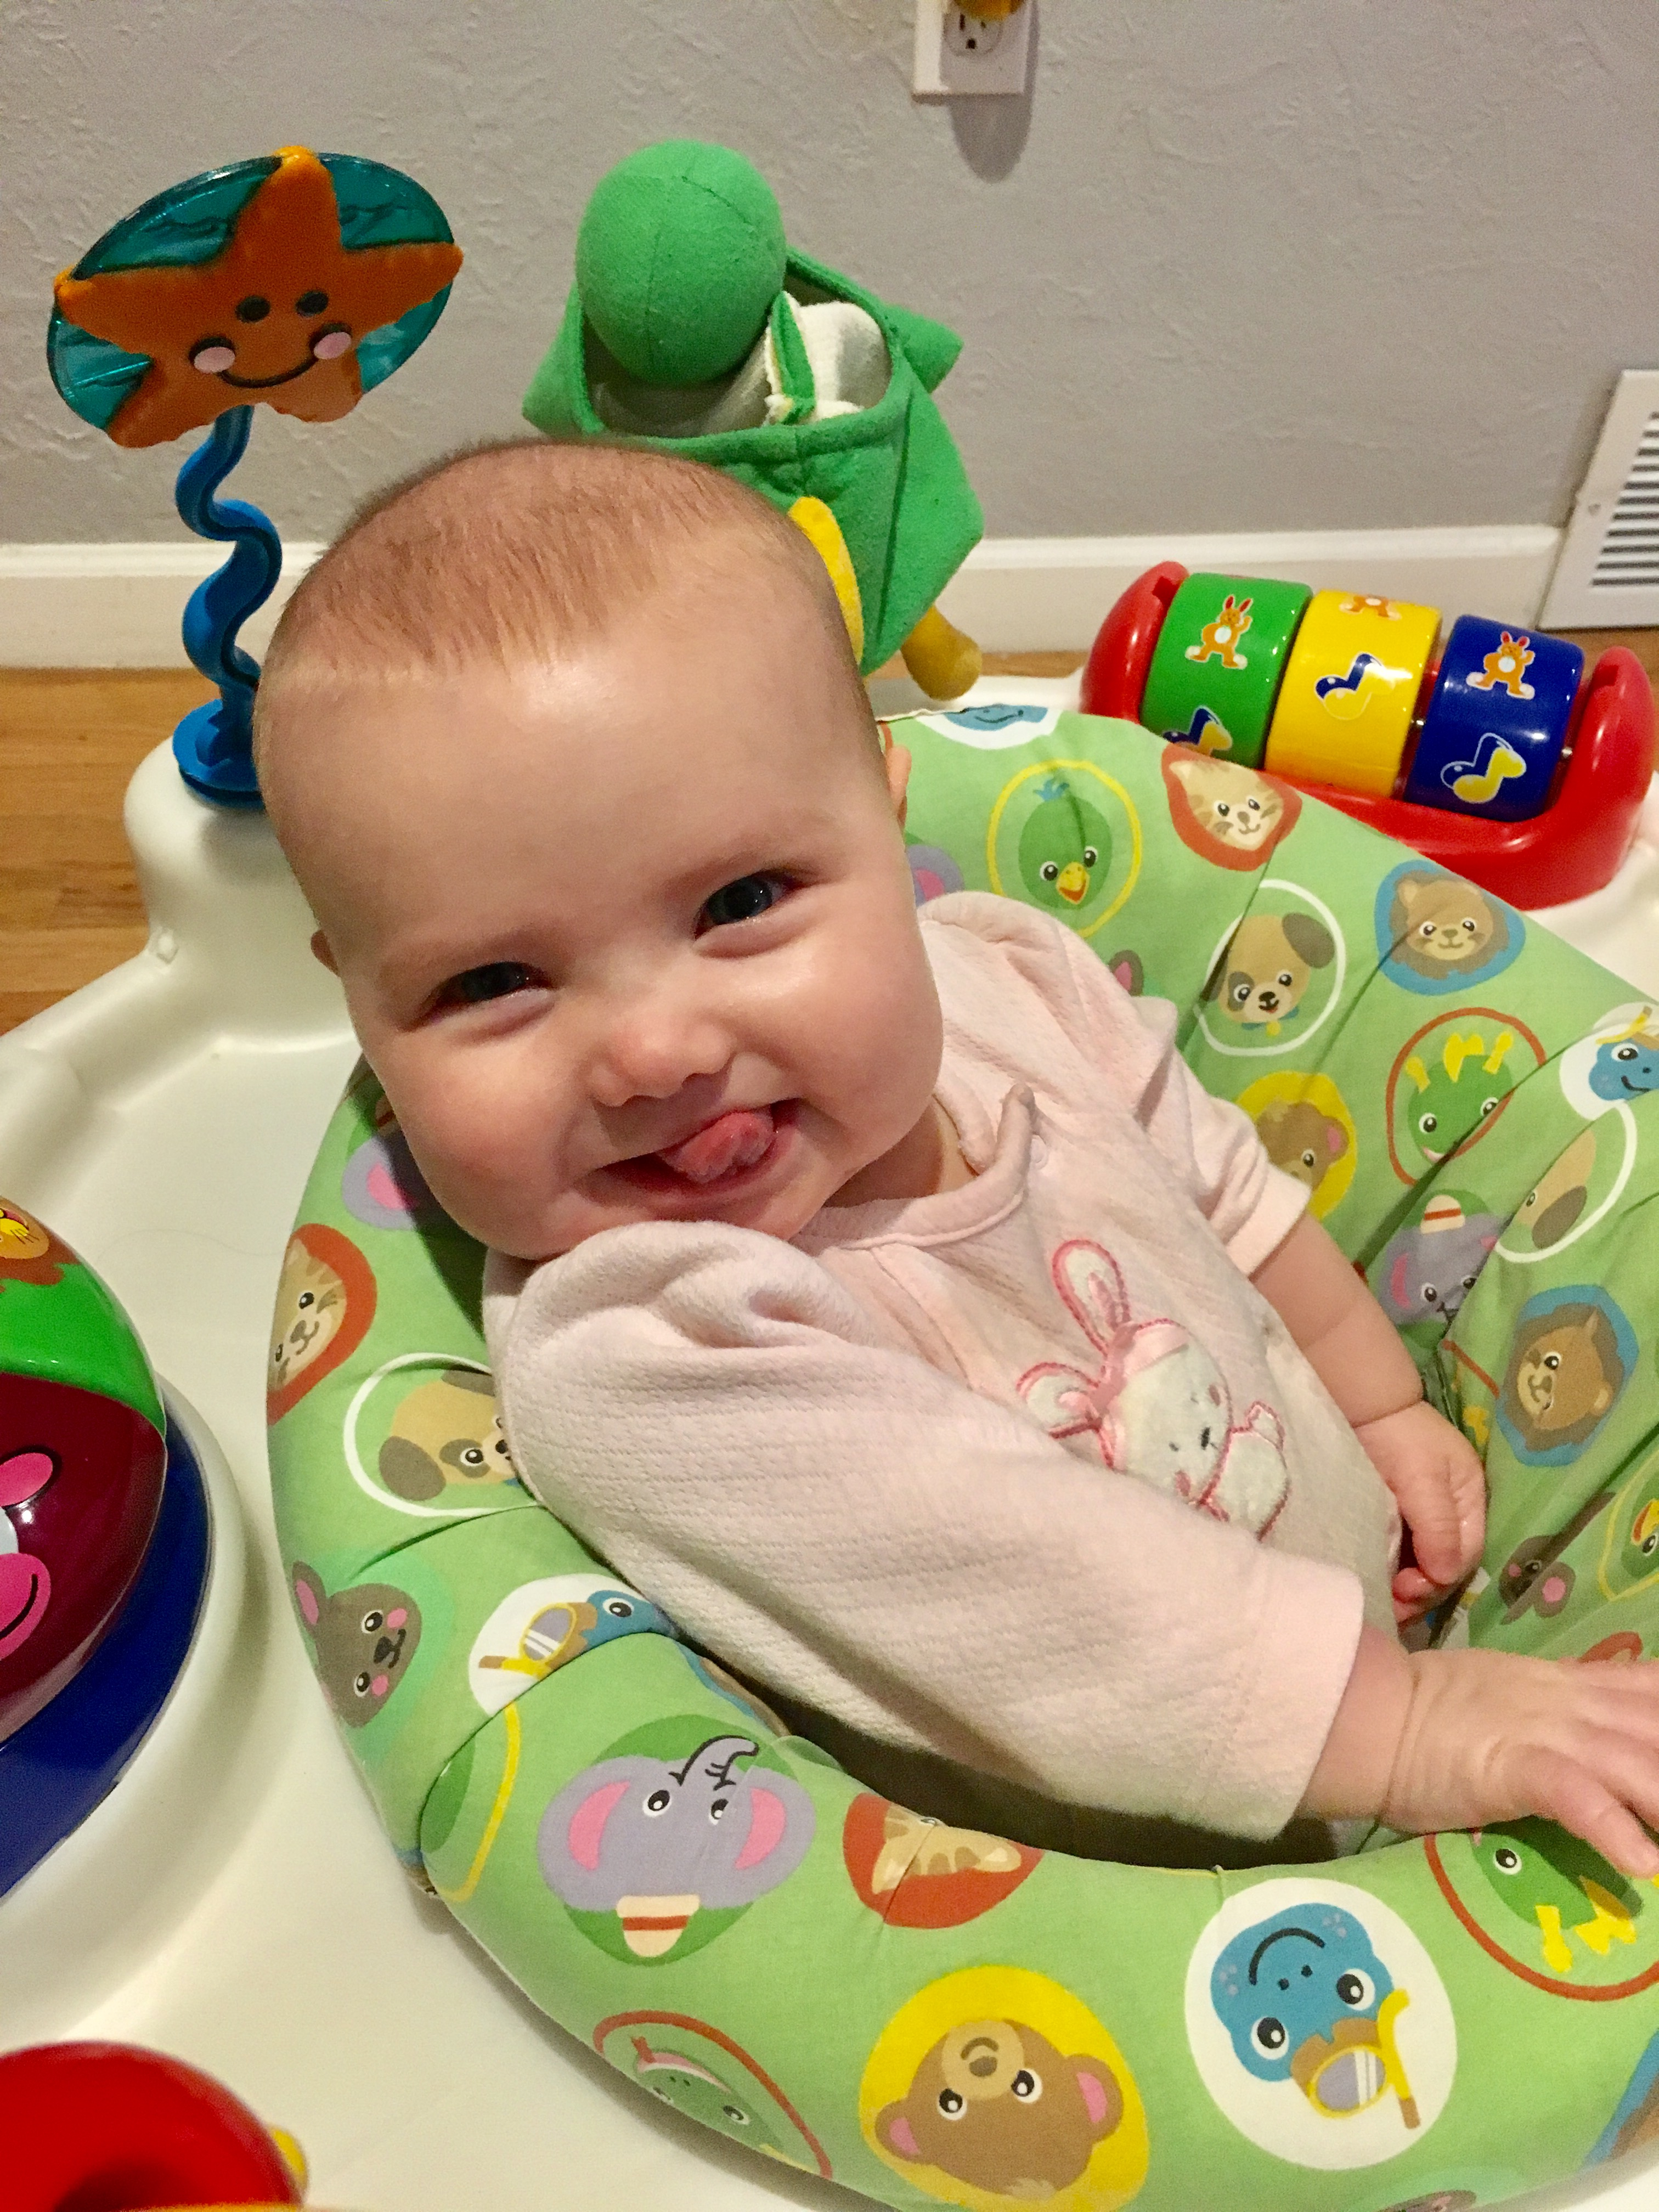 BexBernard, petite fille de 5 mois